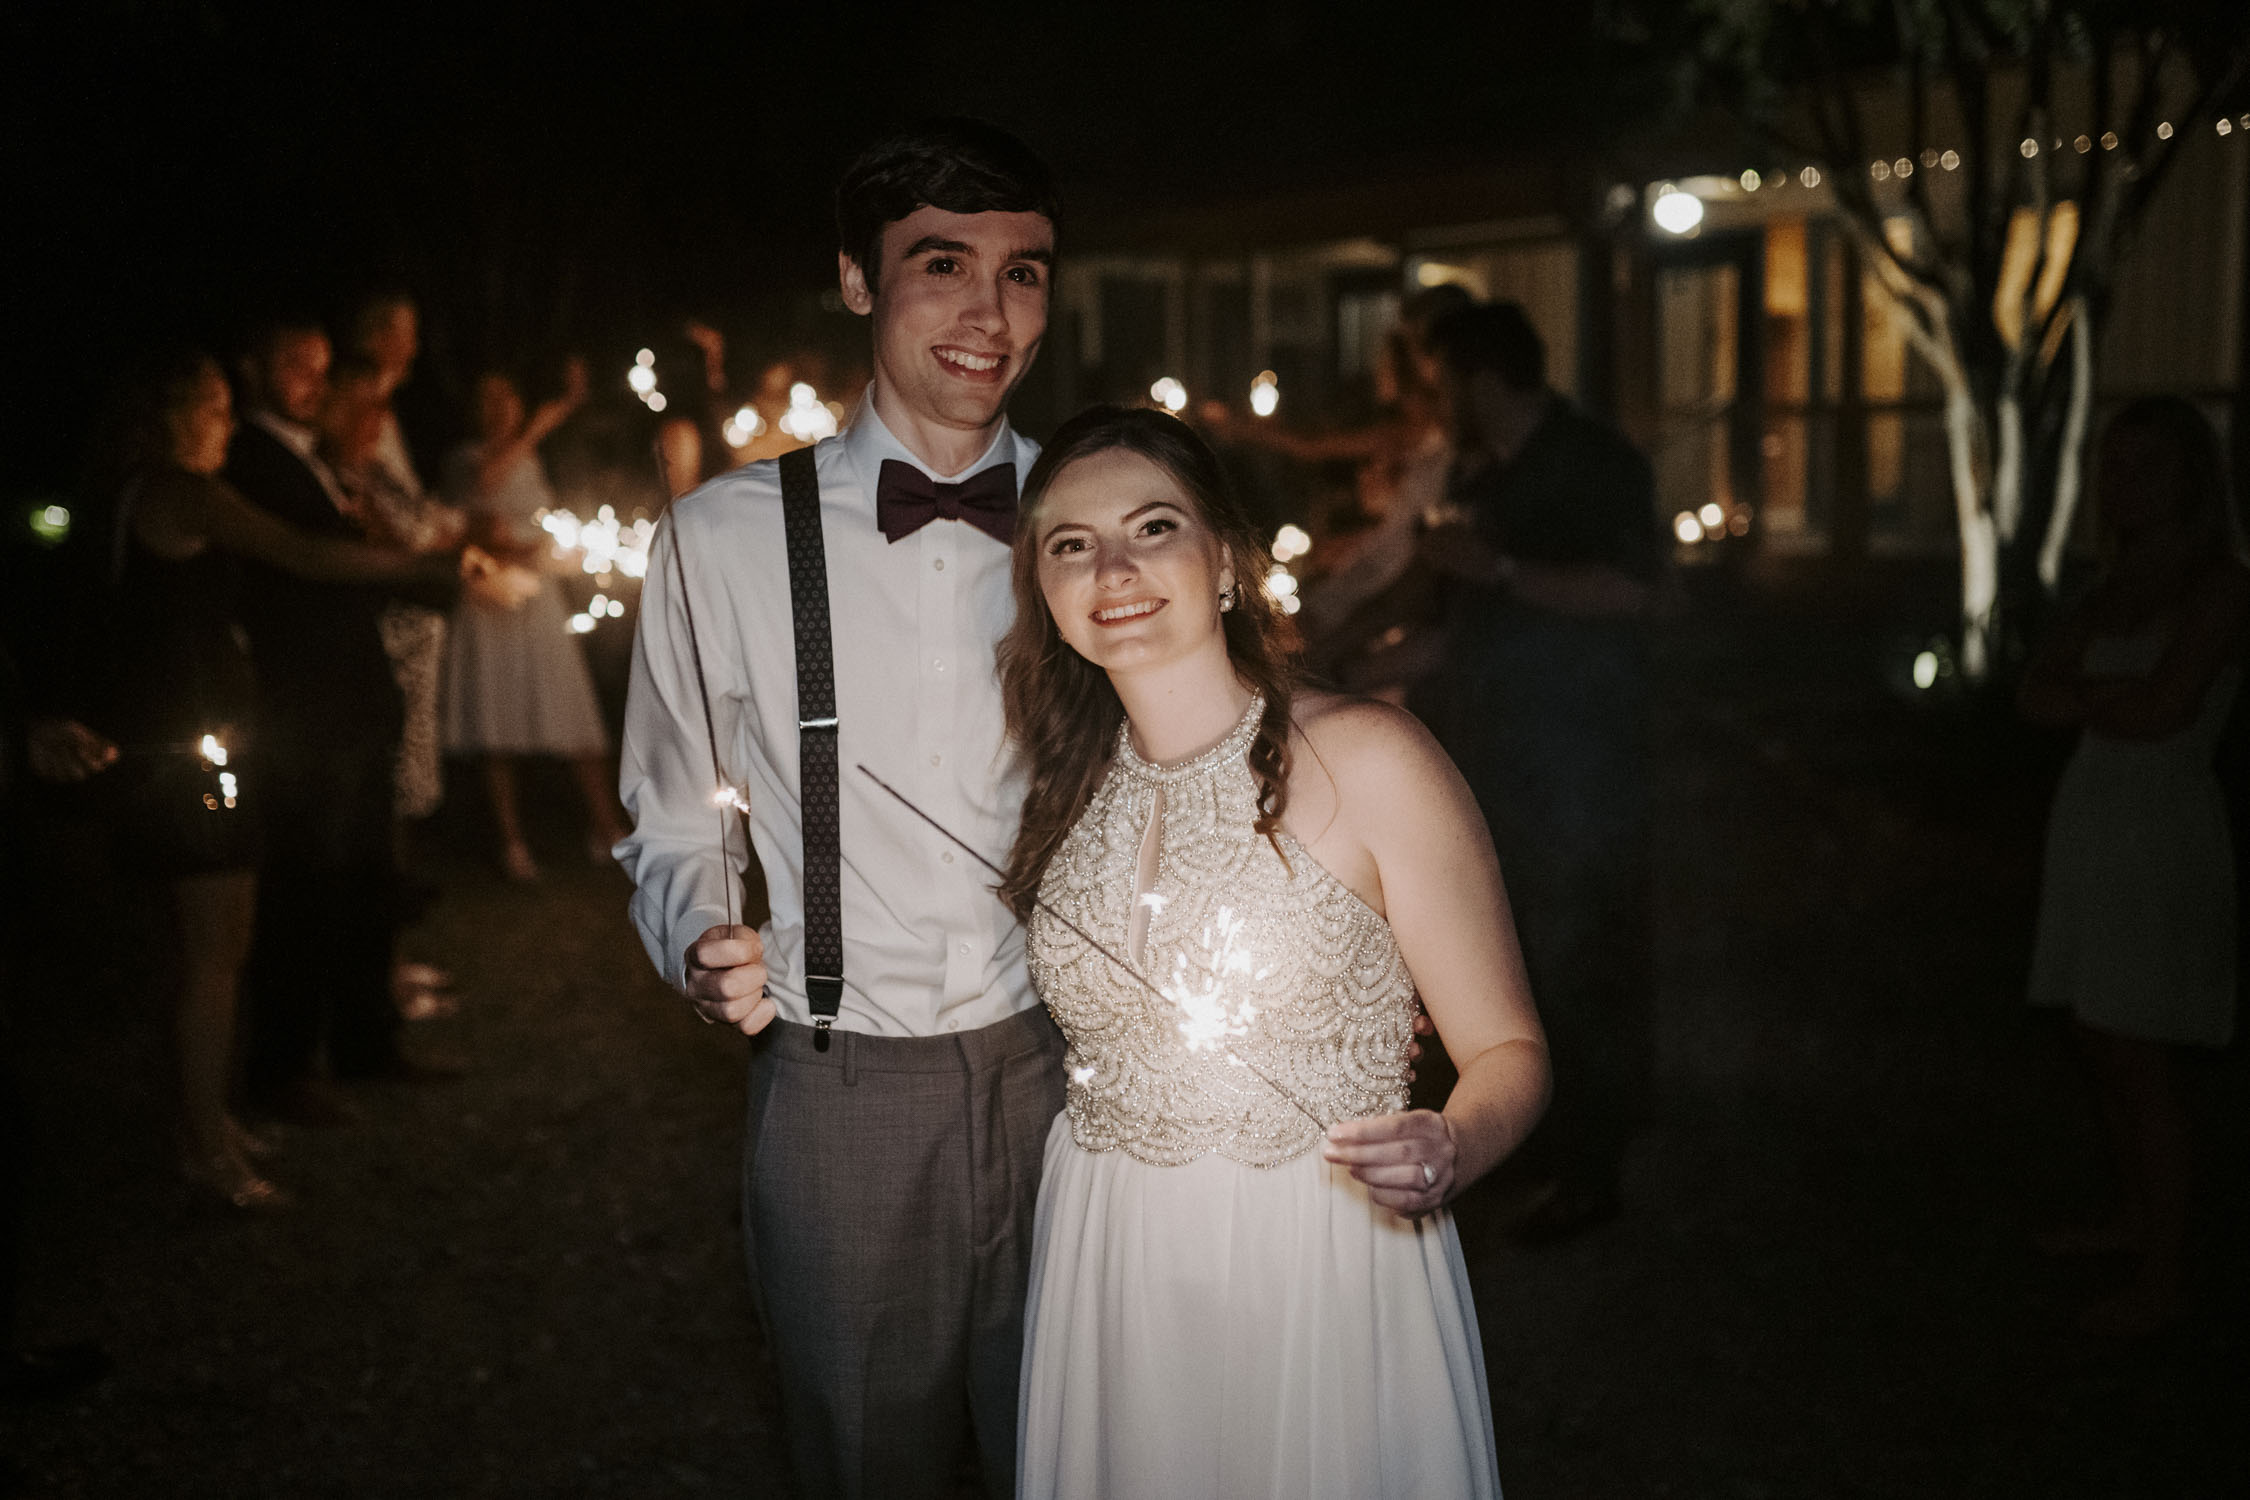 Chapel Hill Wedding Reception Sparkler Exit | Kayli LaFon Photography, North Carolina Intimate Wedding Photographer